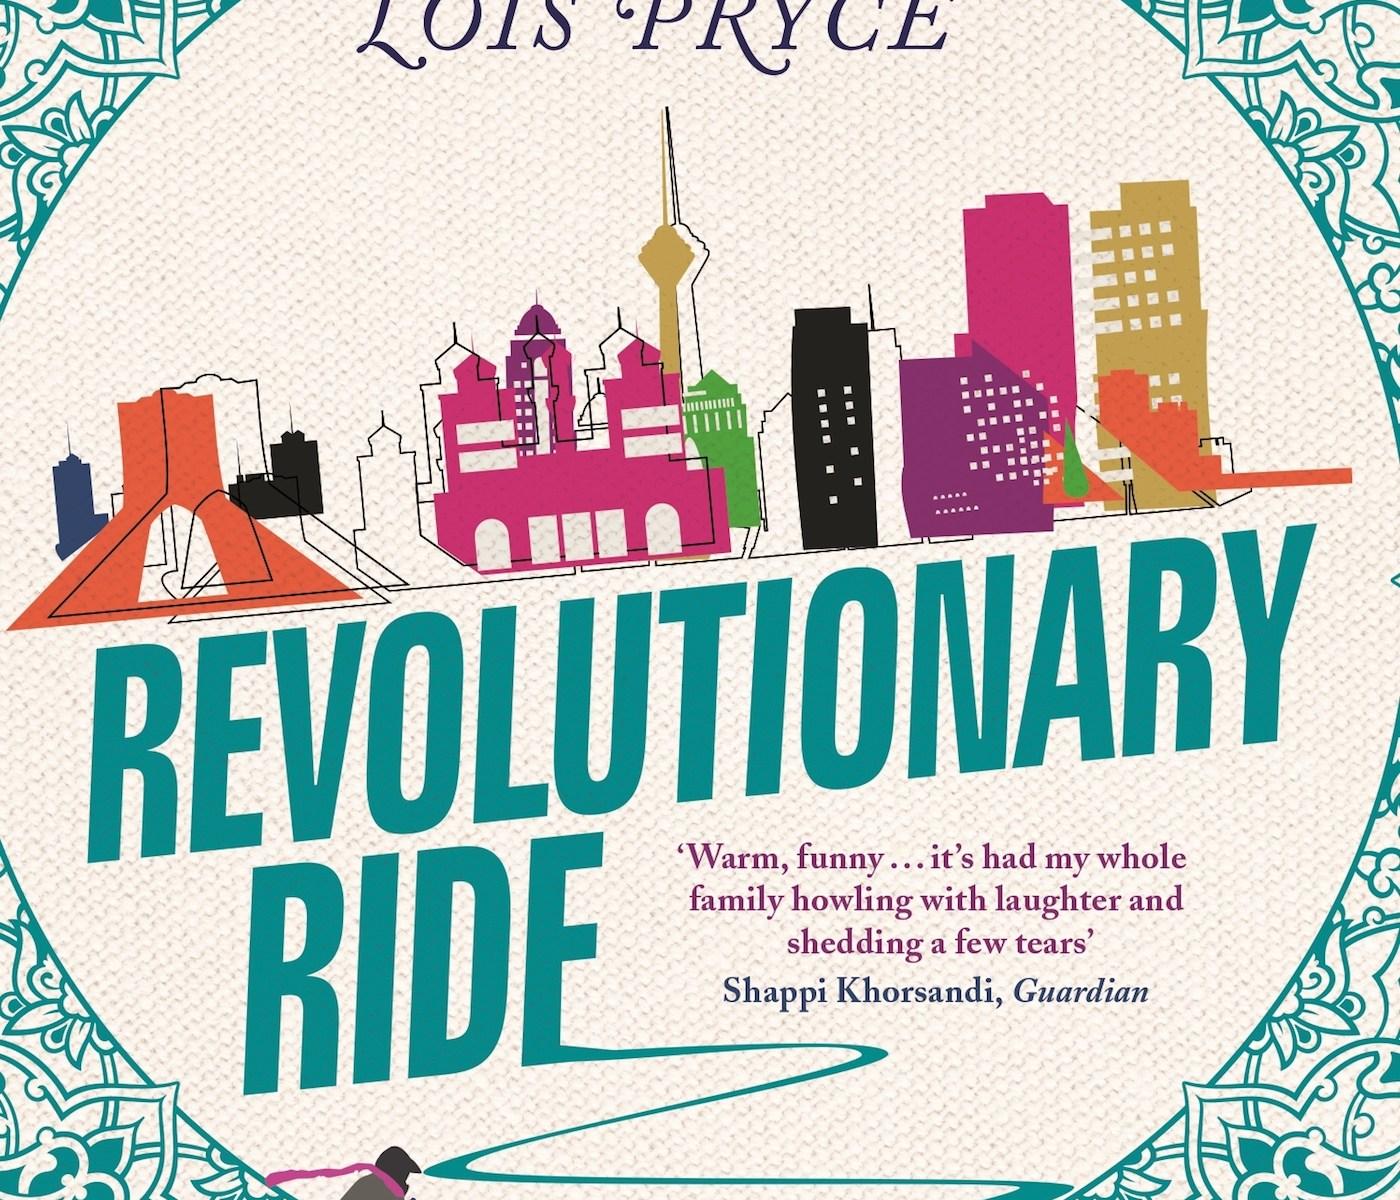 Lois Pryce - Revolutionary Ride cover